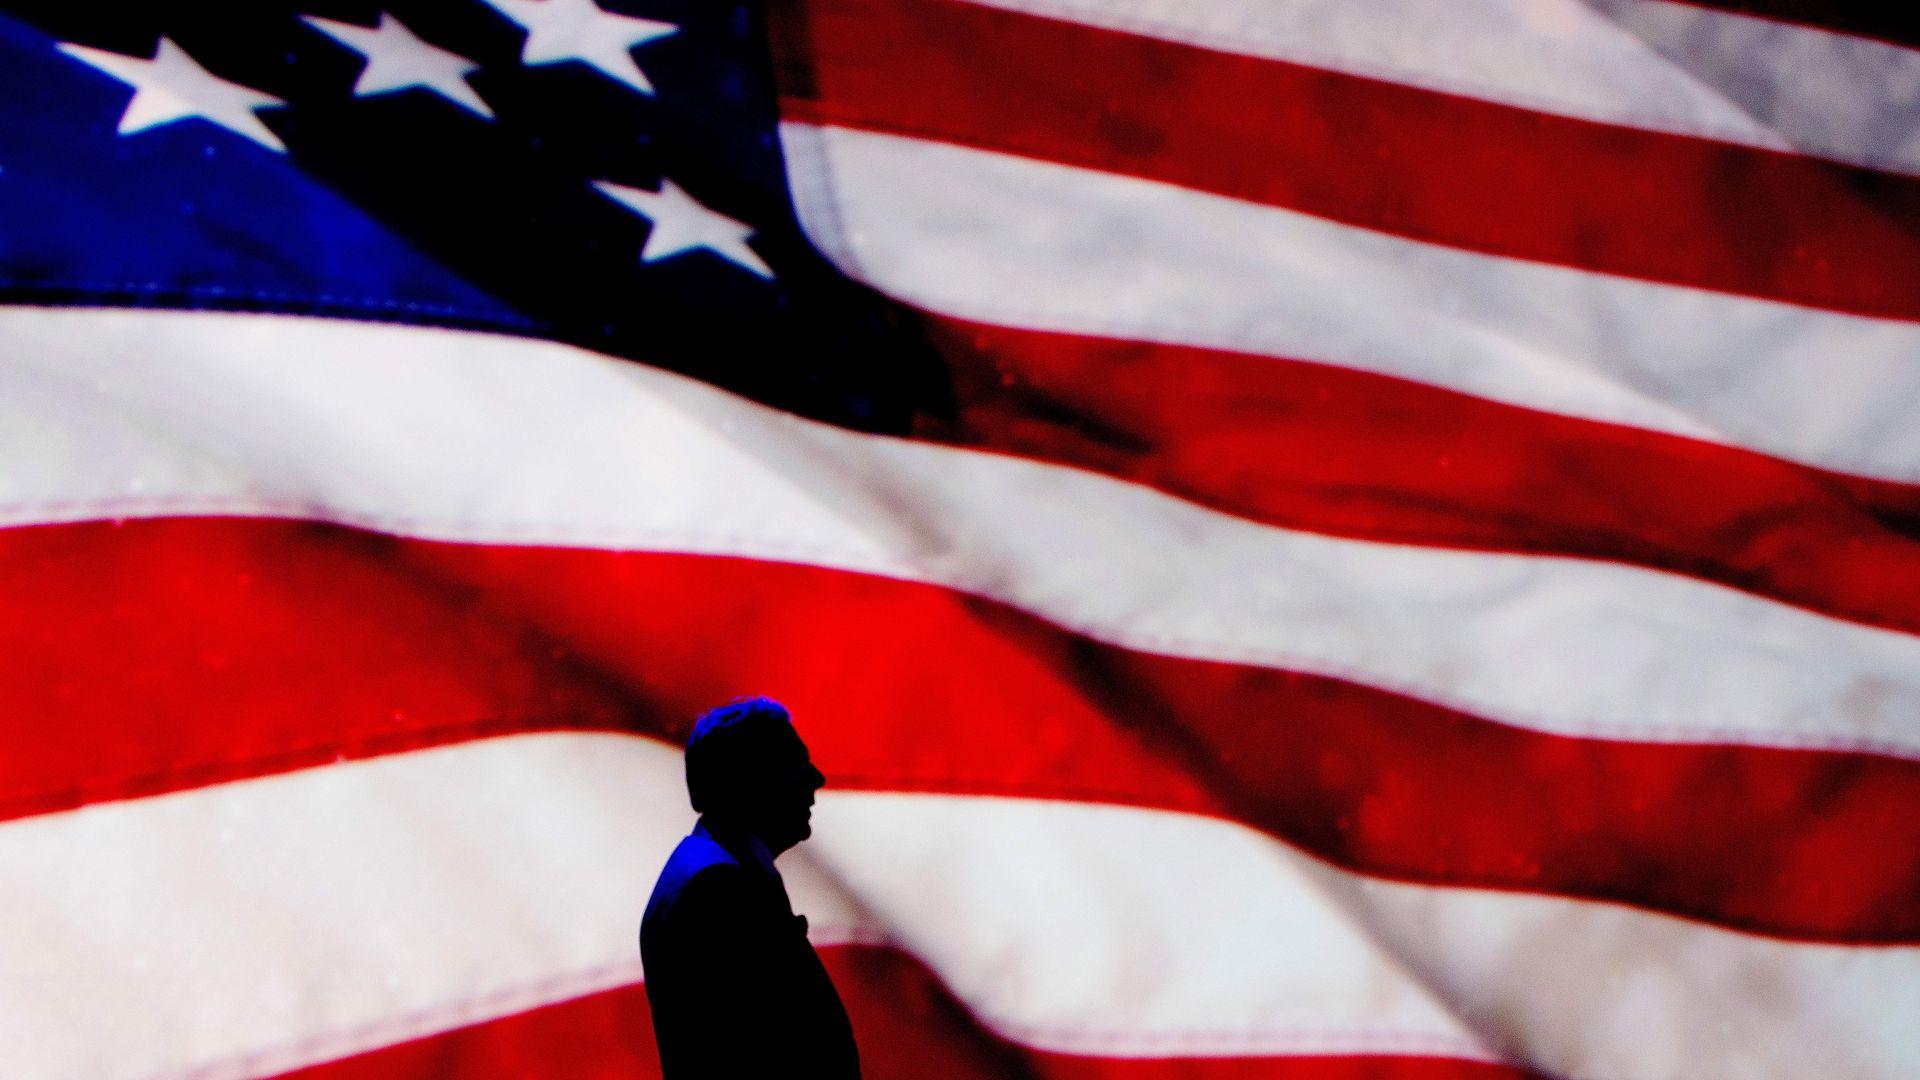 NRA President Wayne LaPierre